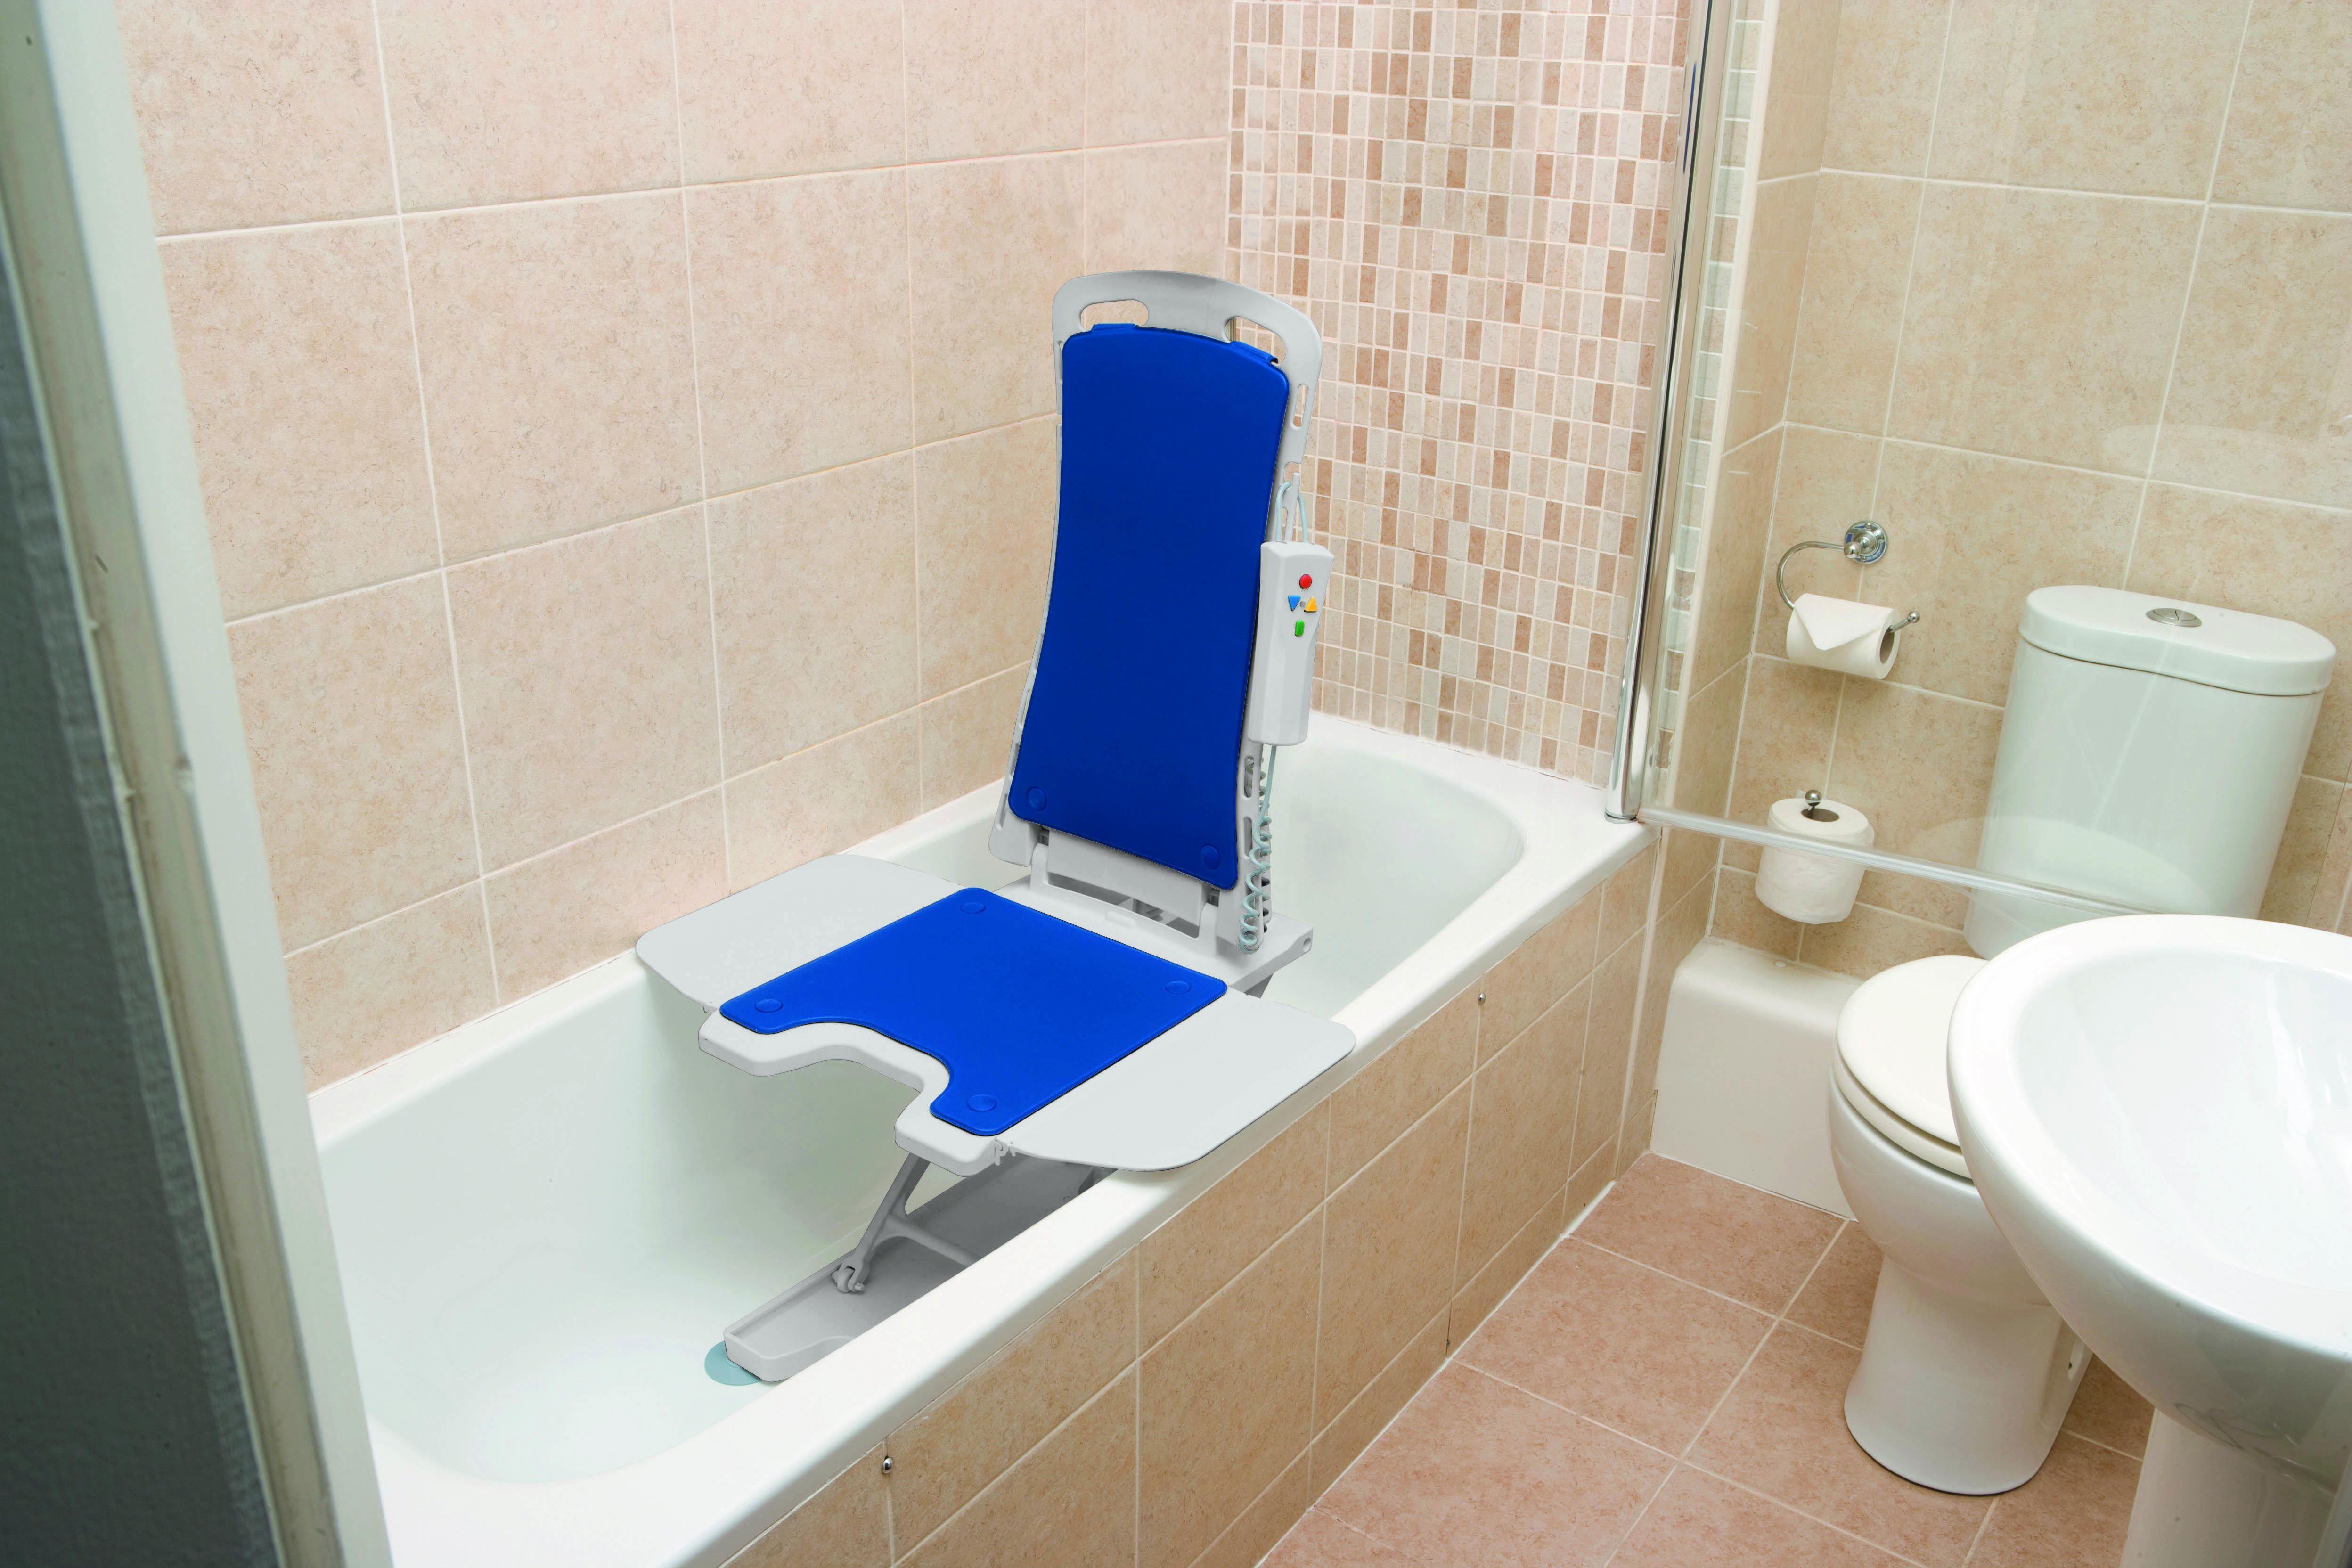 Blue Whisper Bathtub Lift Adaptive Equipment My Mobility Care Bath Lift Bathroom Safety Handicap Bathroom